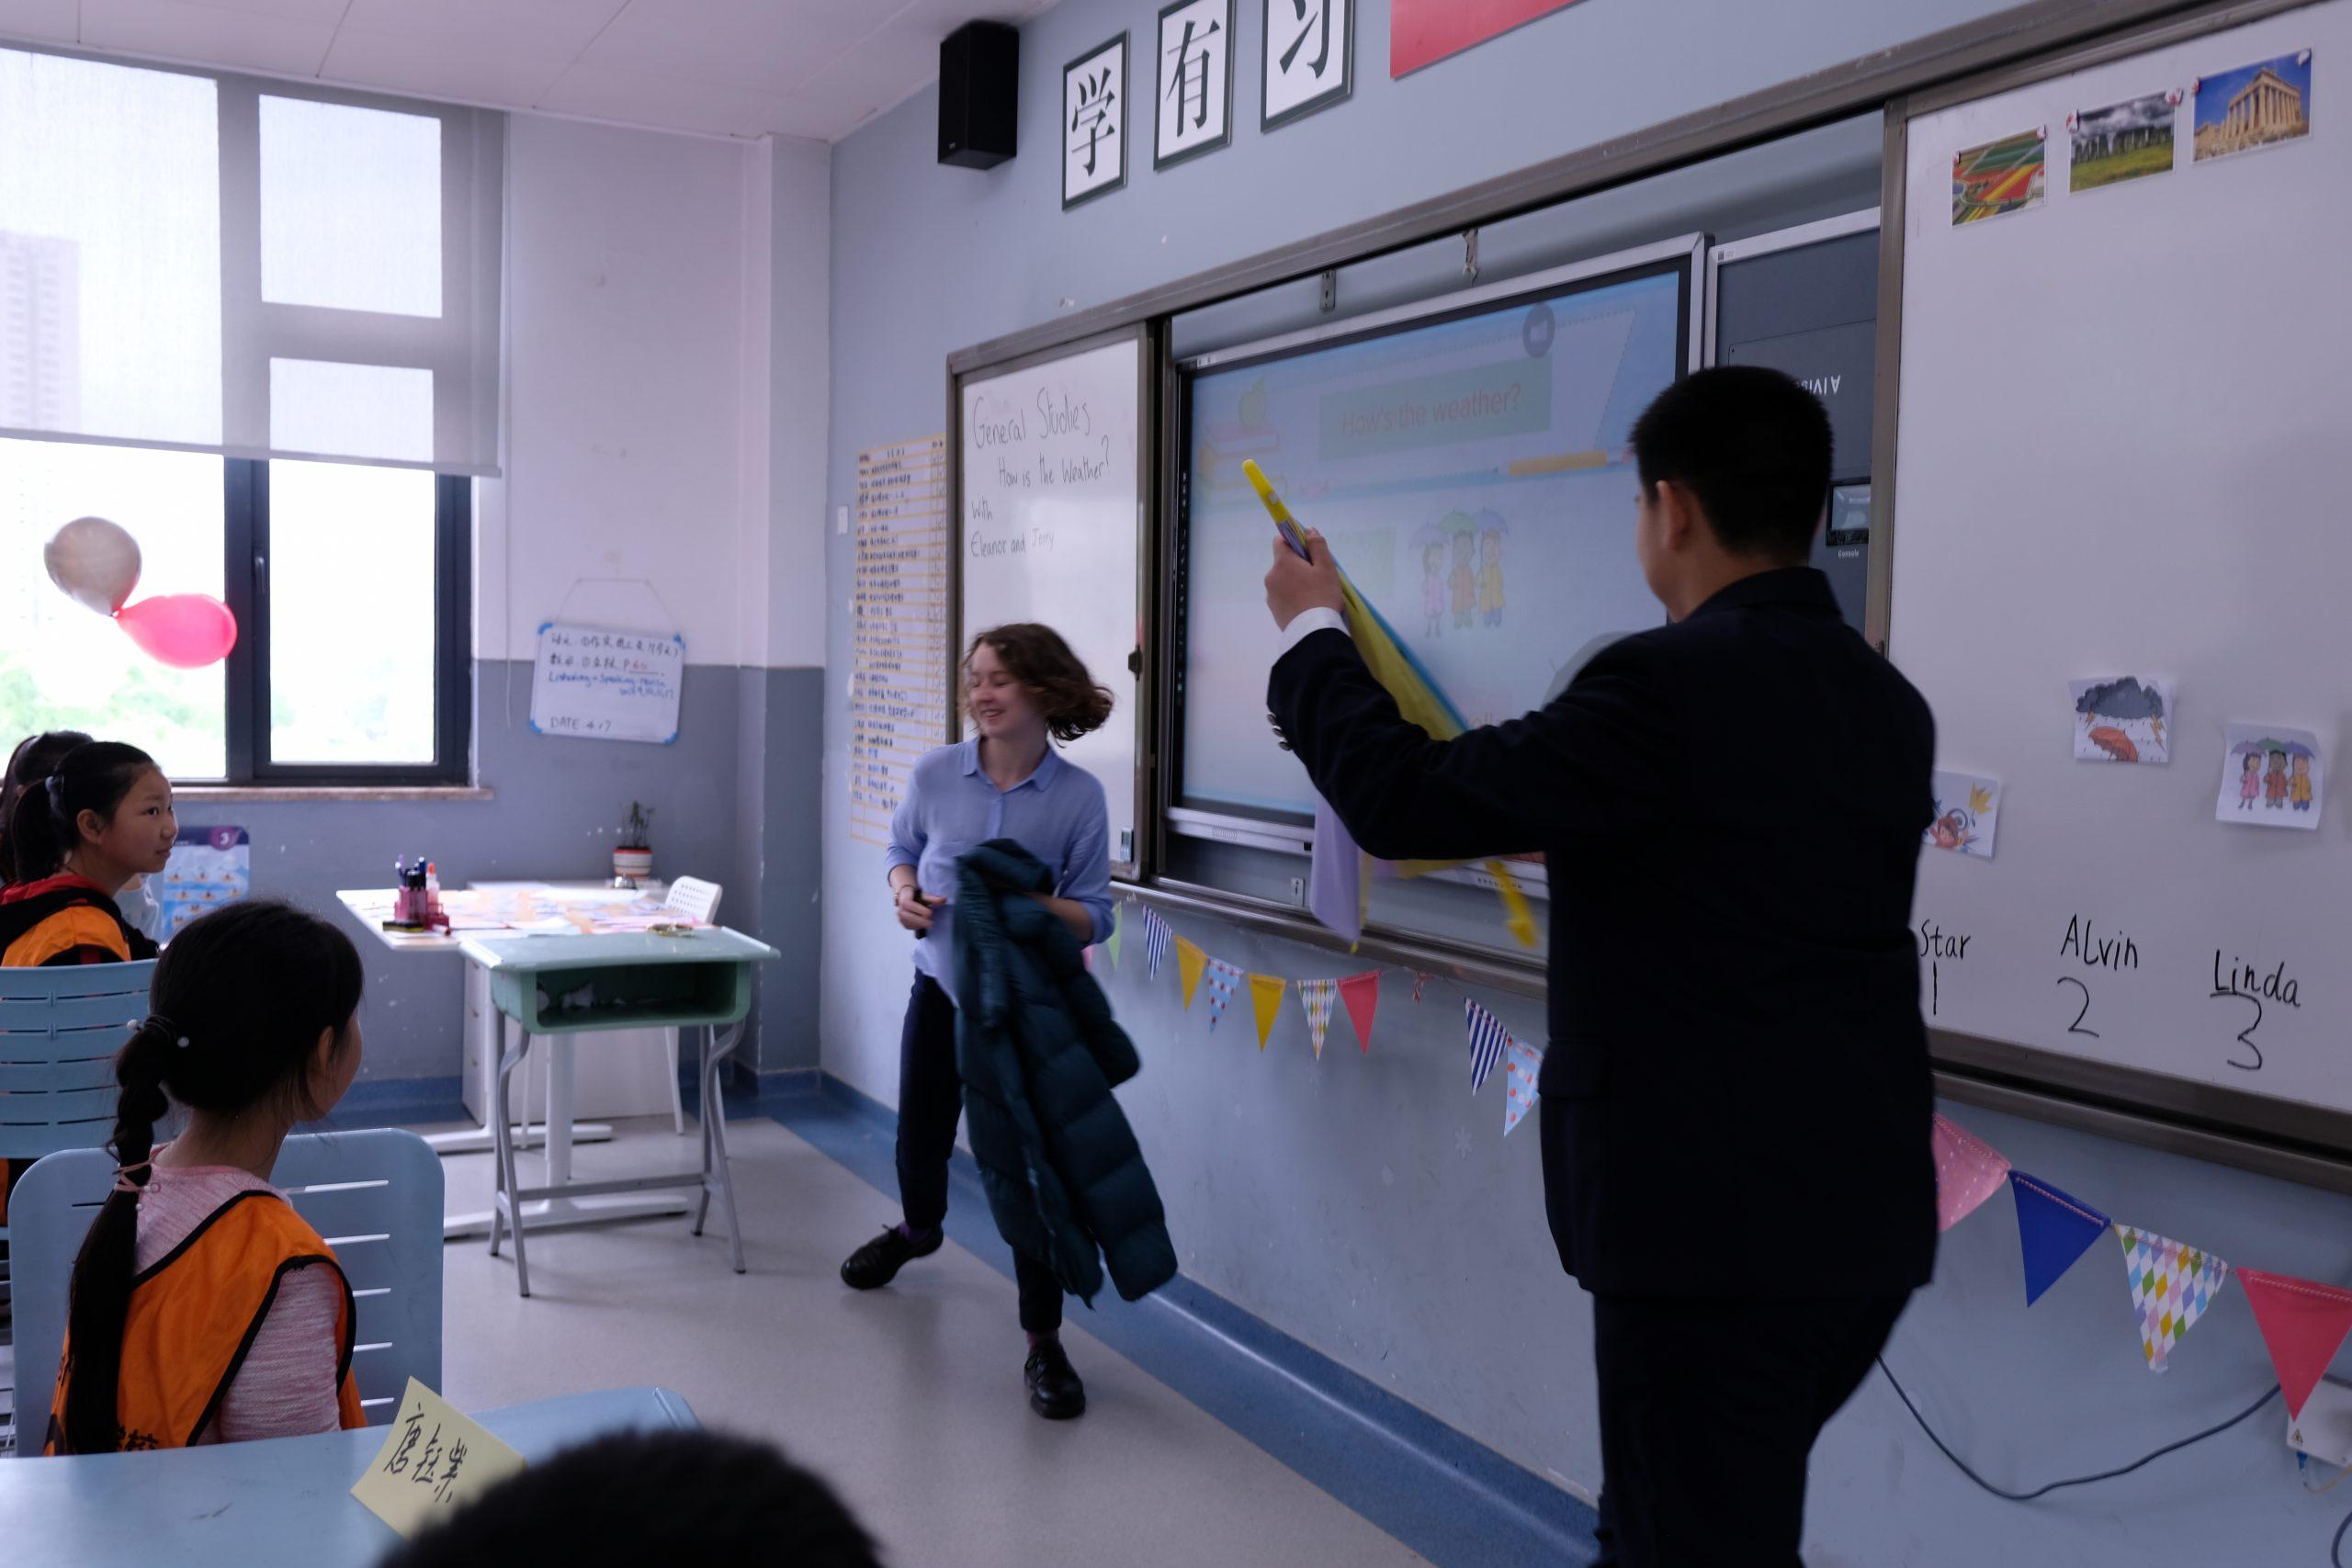 Classroom at Depu Foreign Language school Chongqing during open class